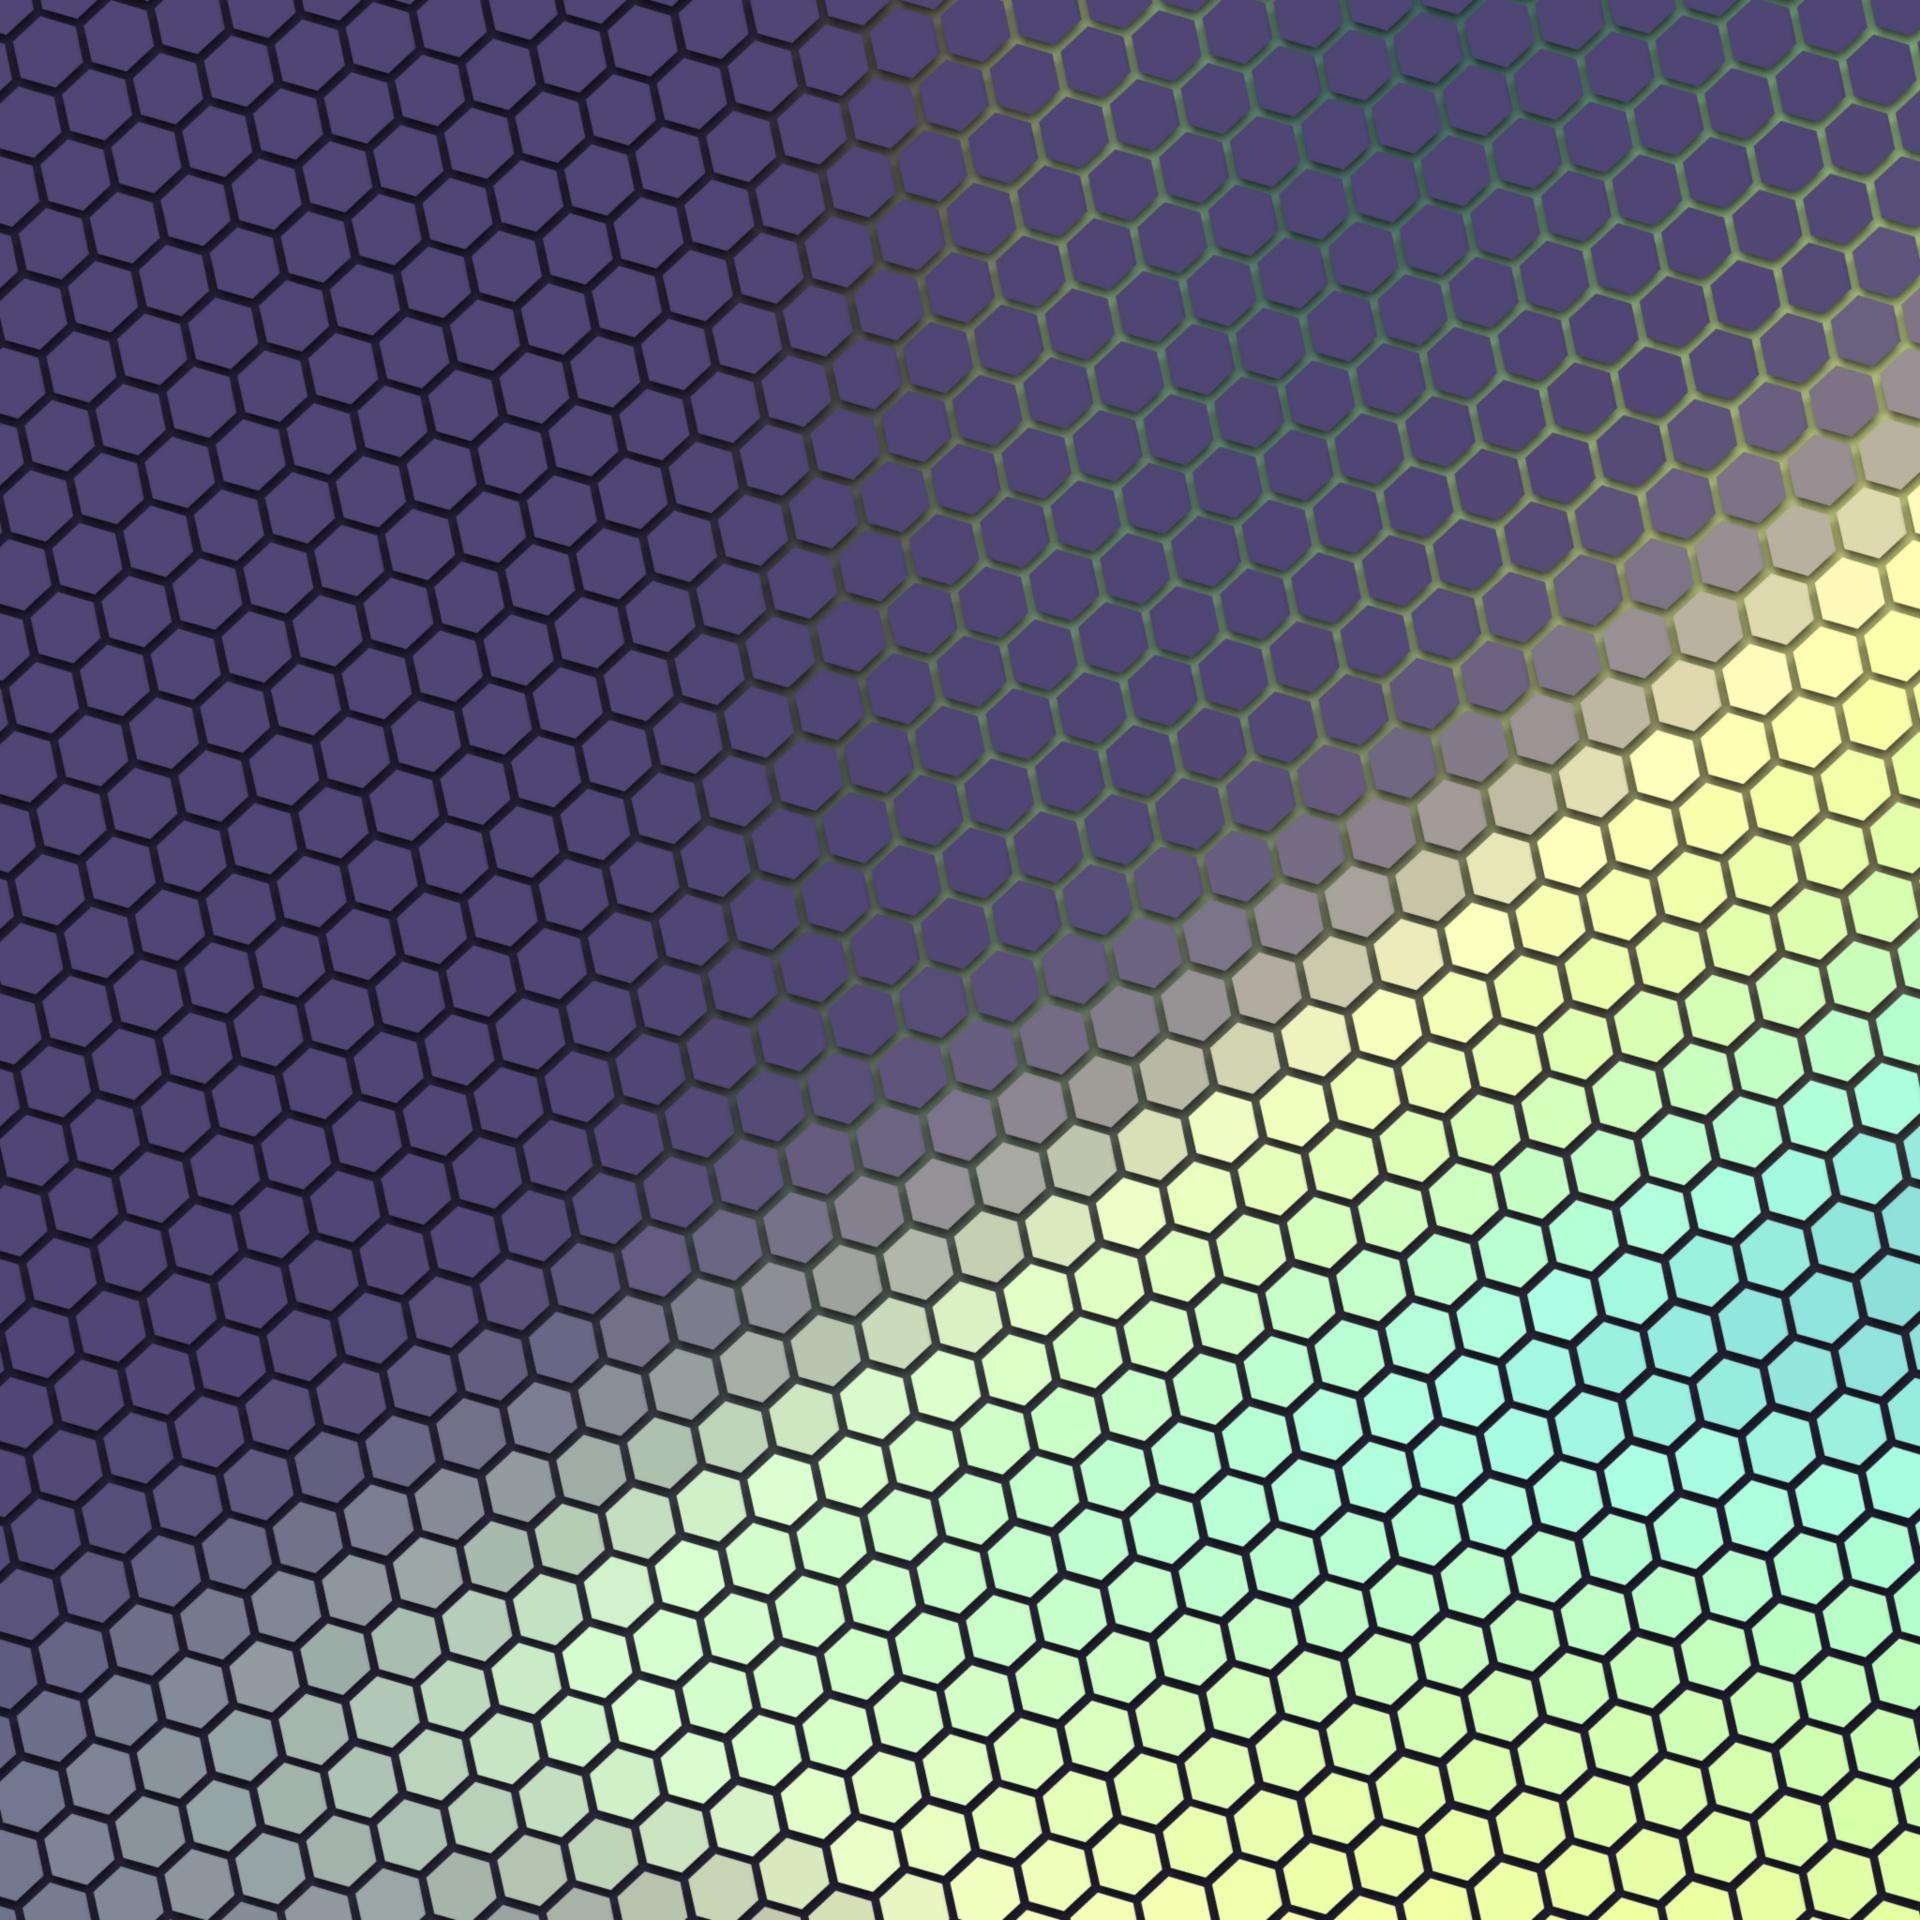 Wallpaperbeehivebeehivepattern   photo from needpixcom 1920x1920